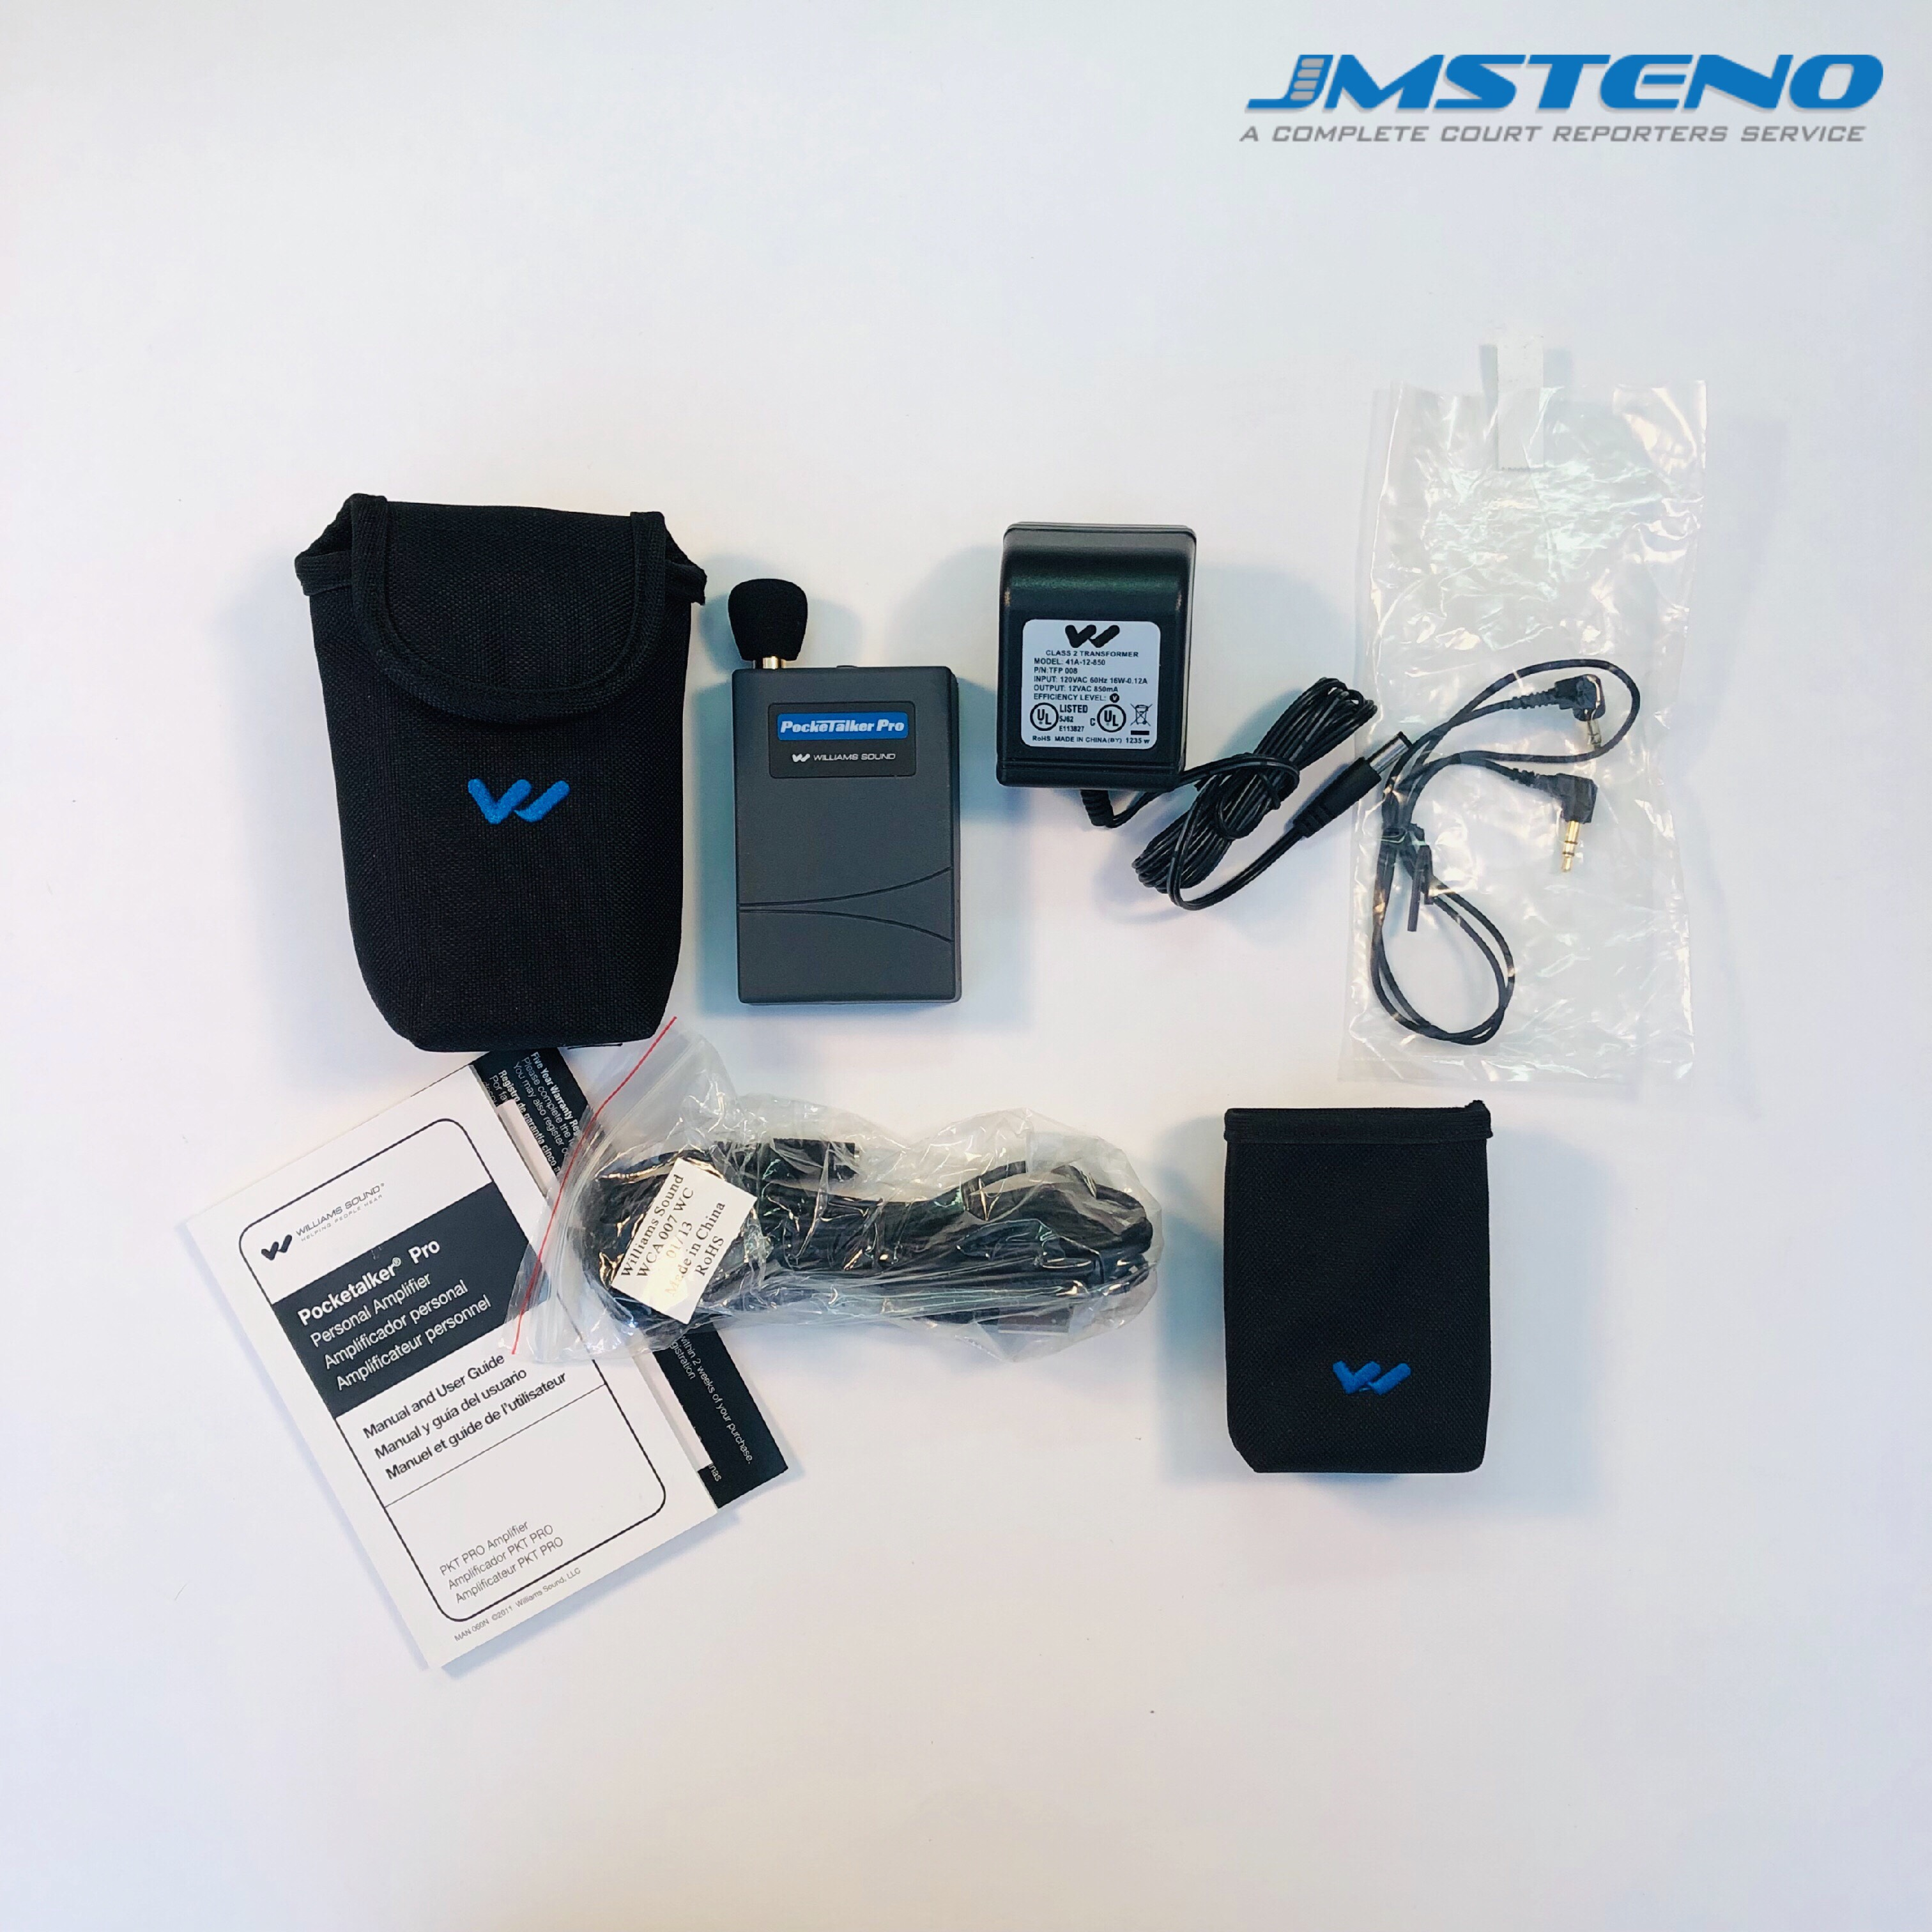 No Earphone Williams Sound PKT PRO1-0 Pocketalker Pro System Omnidirectional Microphone